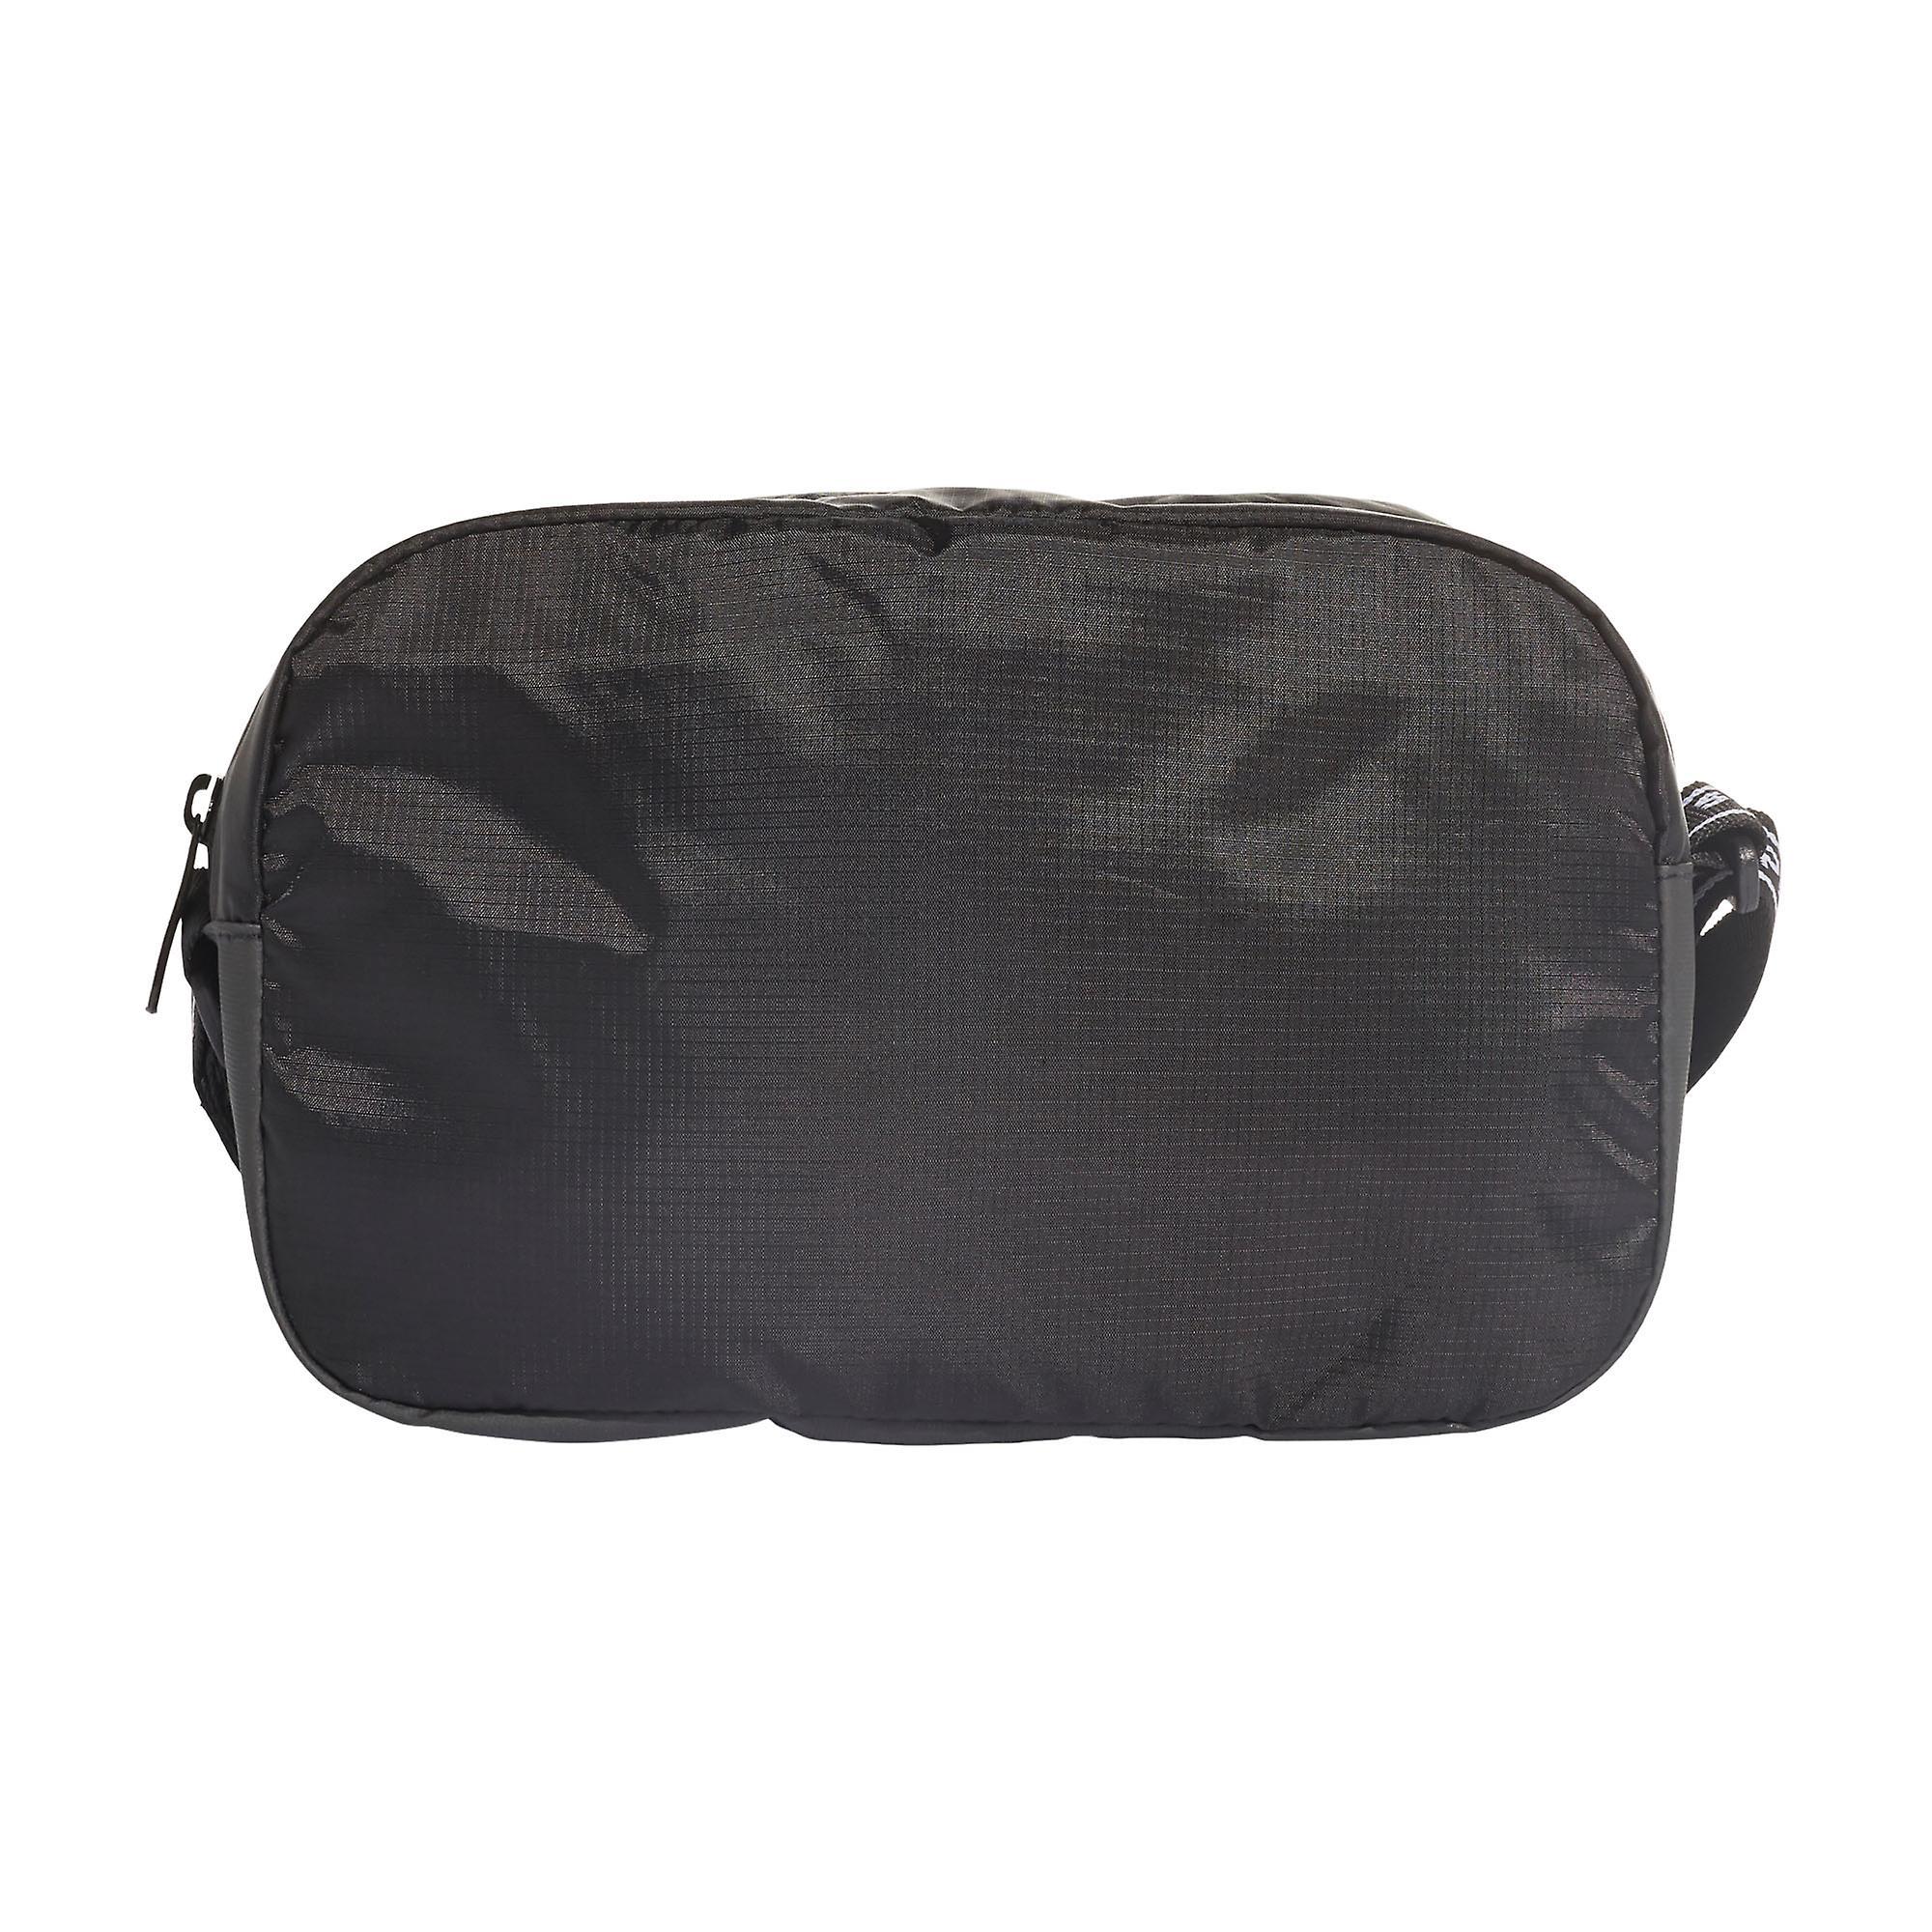 adidas Organiser Cross Body Shoulder Small Item Man Bag Black/White